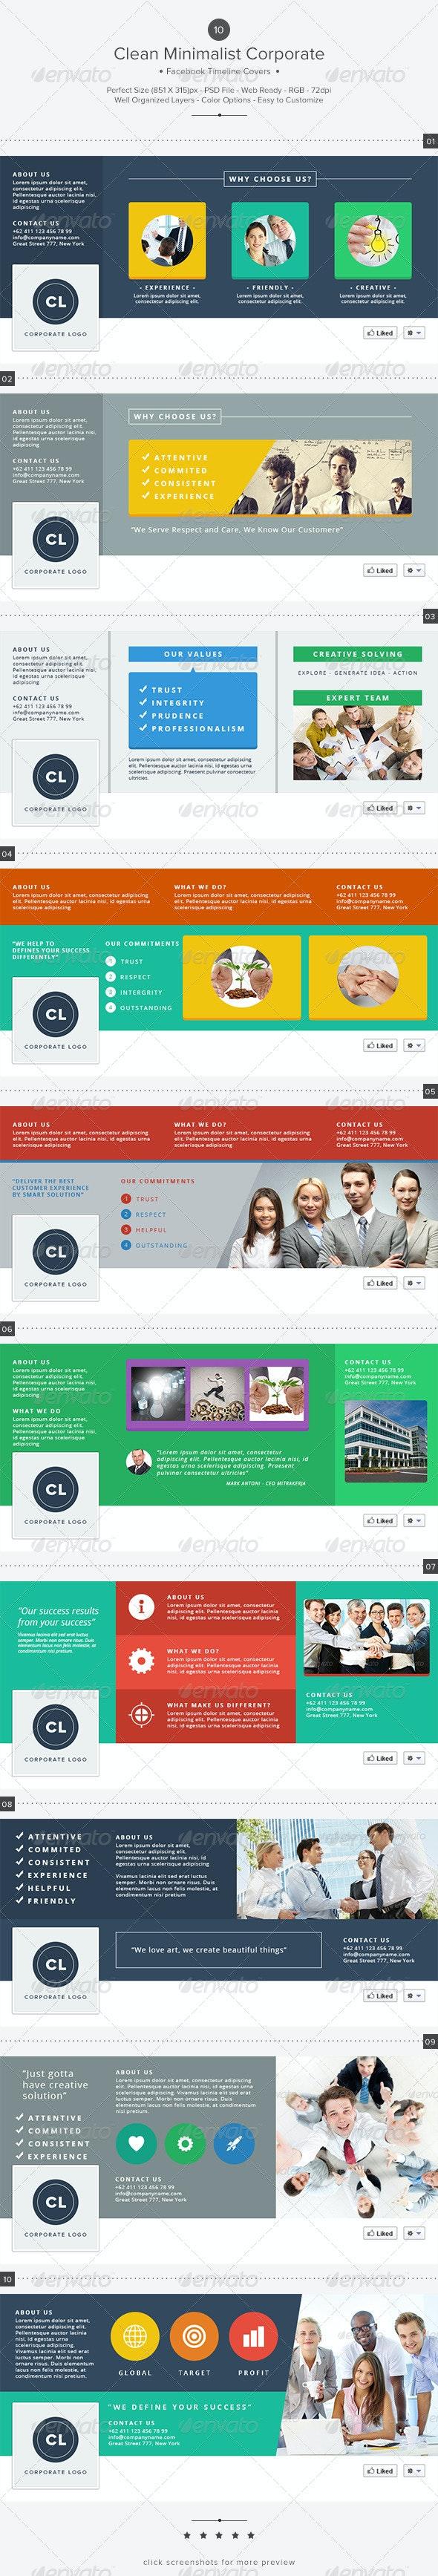 10 Clean Minimalist Corporate Facebook Covers - Facebook Timeline Covers Social Media